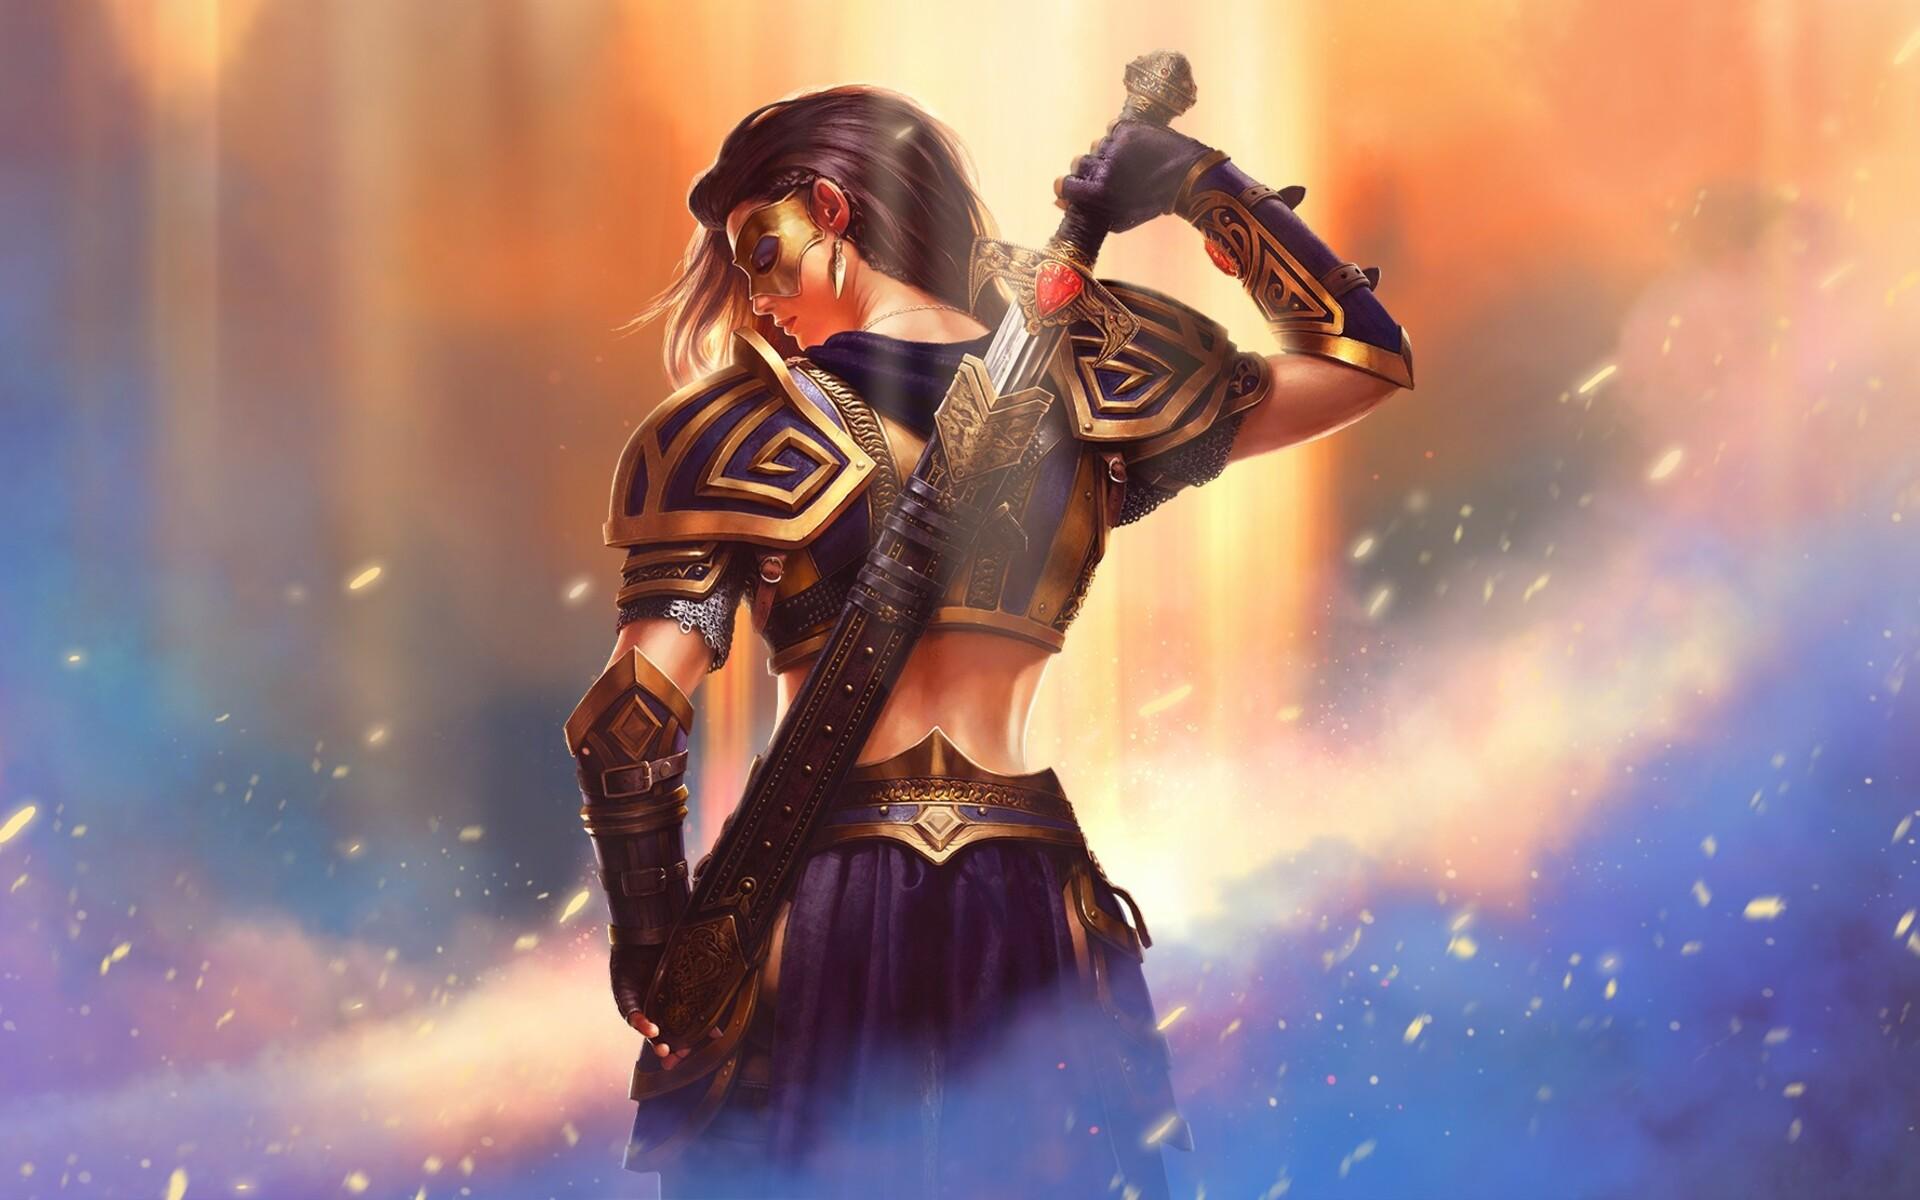 1920x1200 Warrior Fantasy Girl 1080P Resolution HD 4k ...